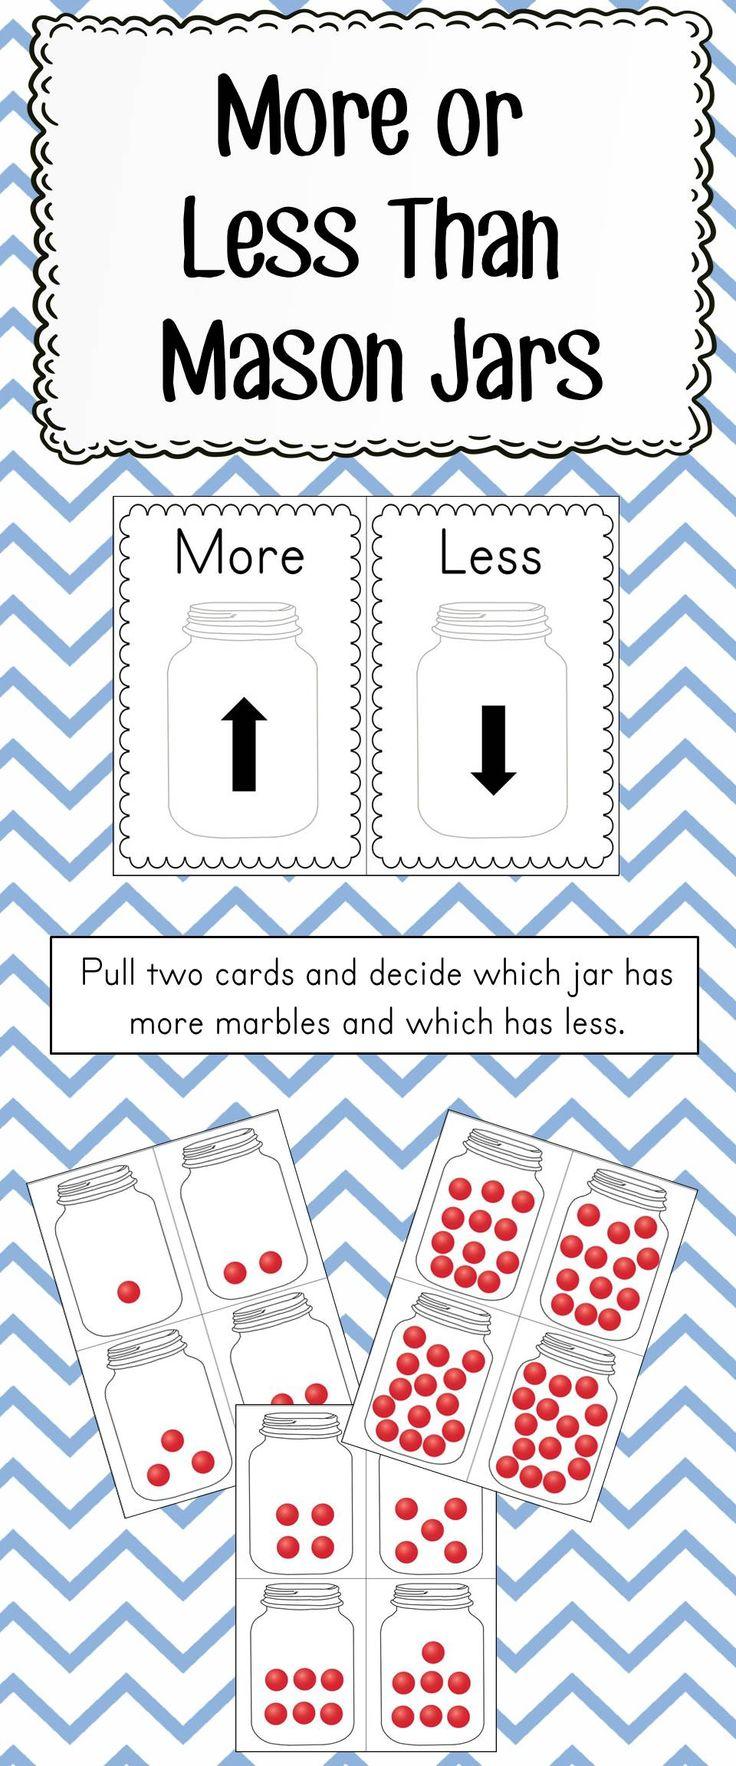 Kindergarten Math Center Game. Sort Cards Into More or Less Categories